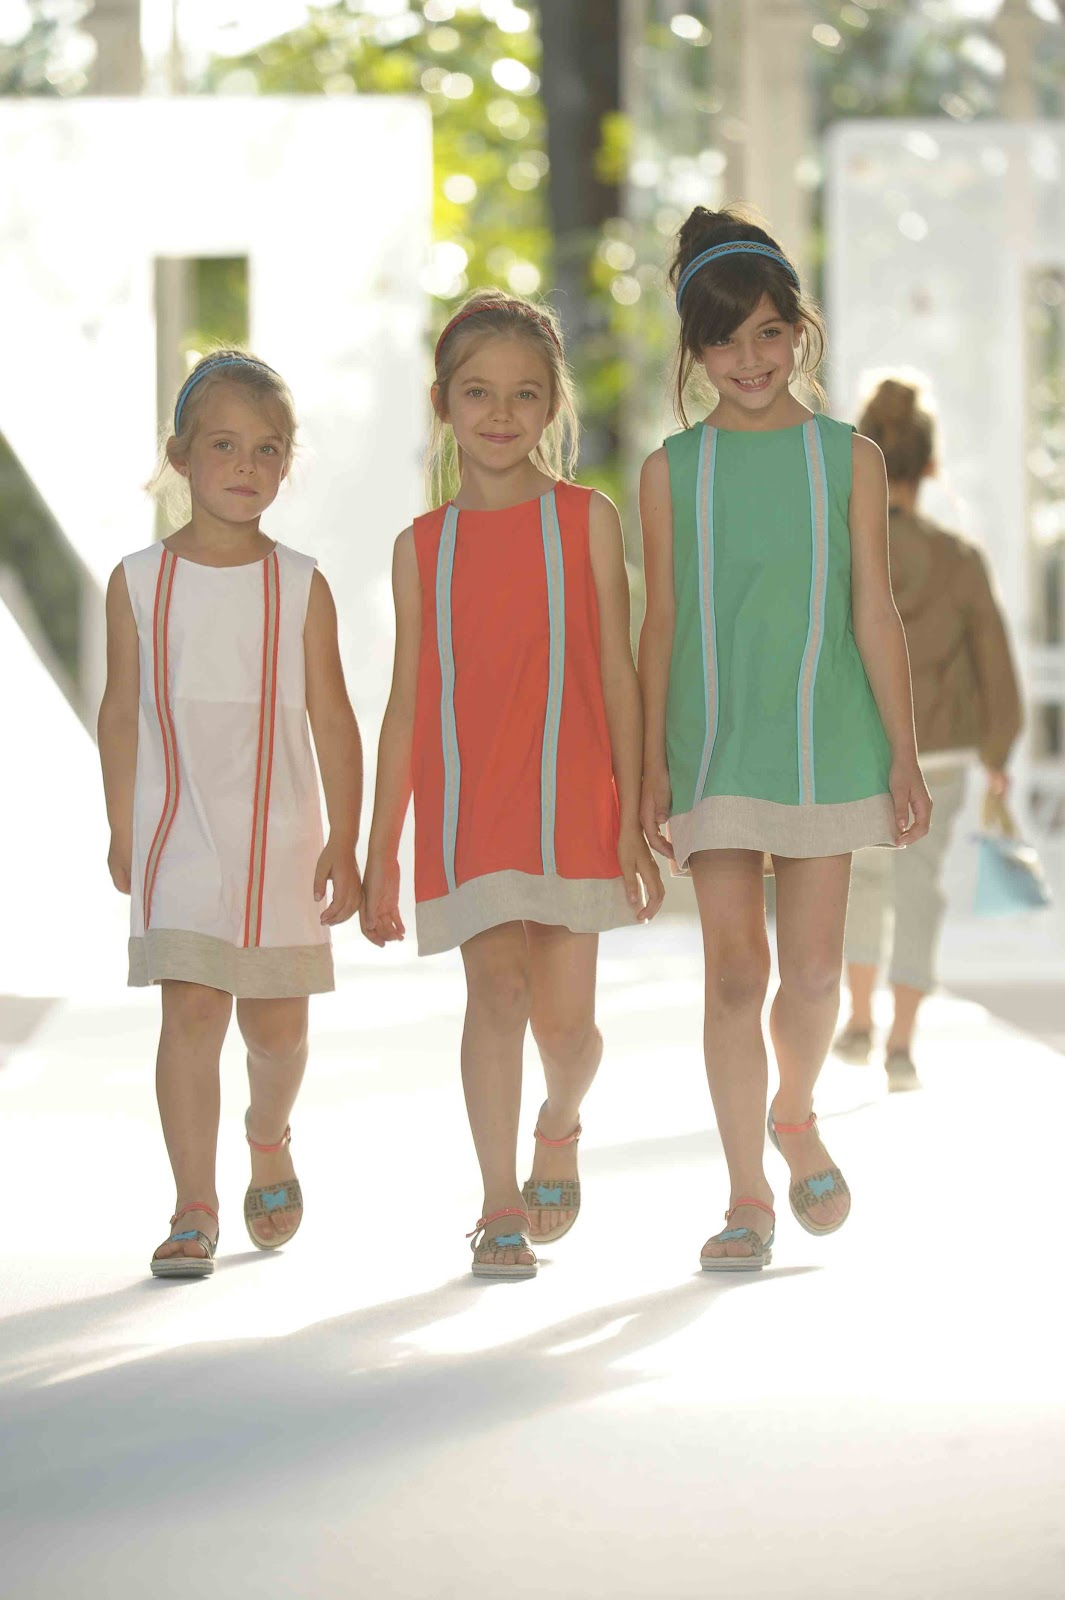 Awesome Fashion 2012 Awesome Childrens Fashion Dresses 2012